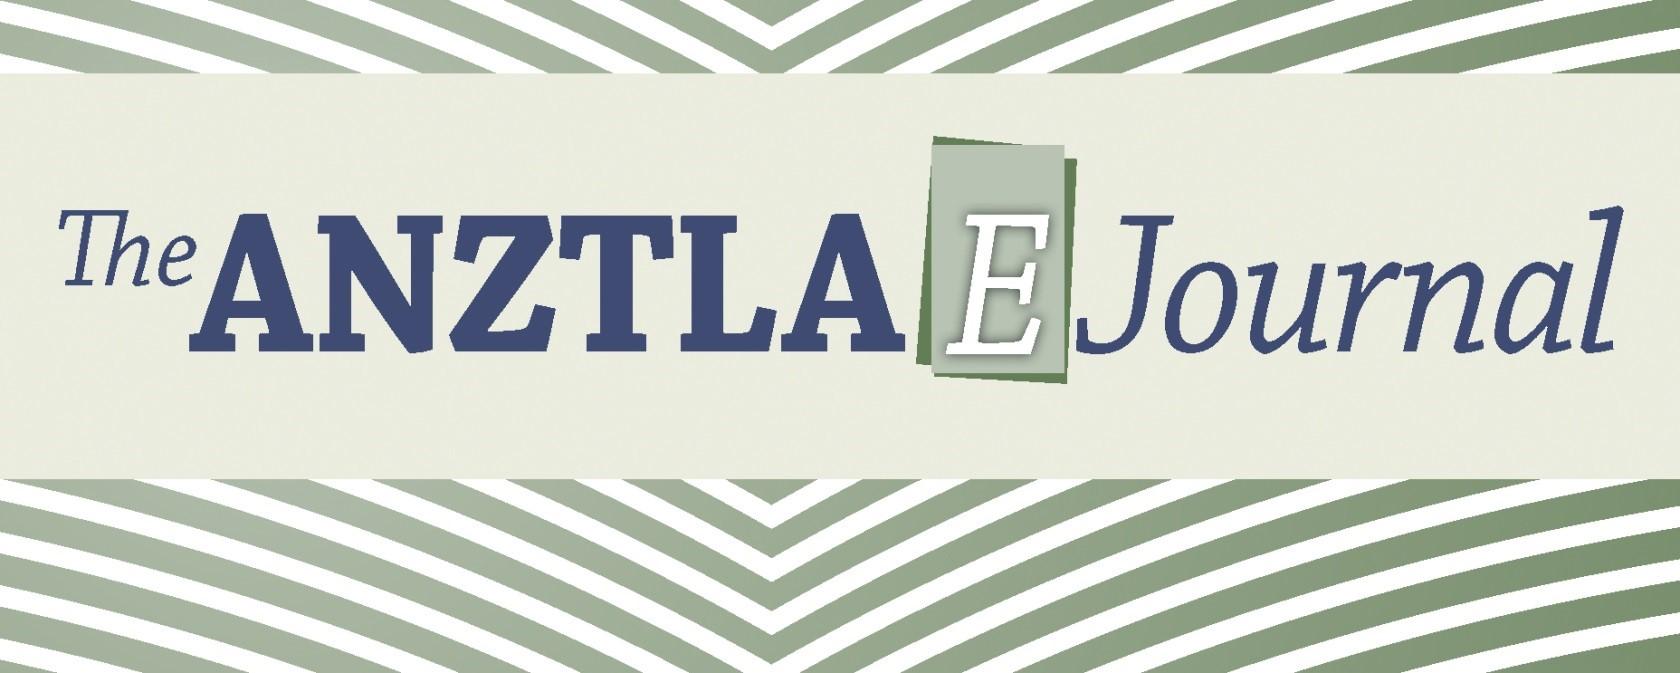 The ANZTLA EJournal logo